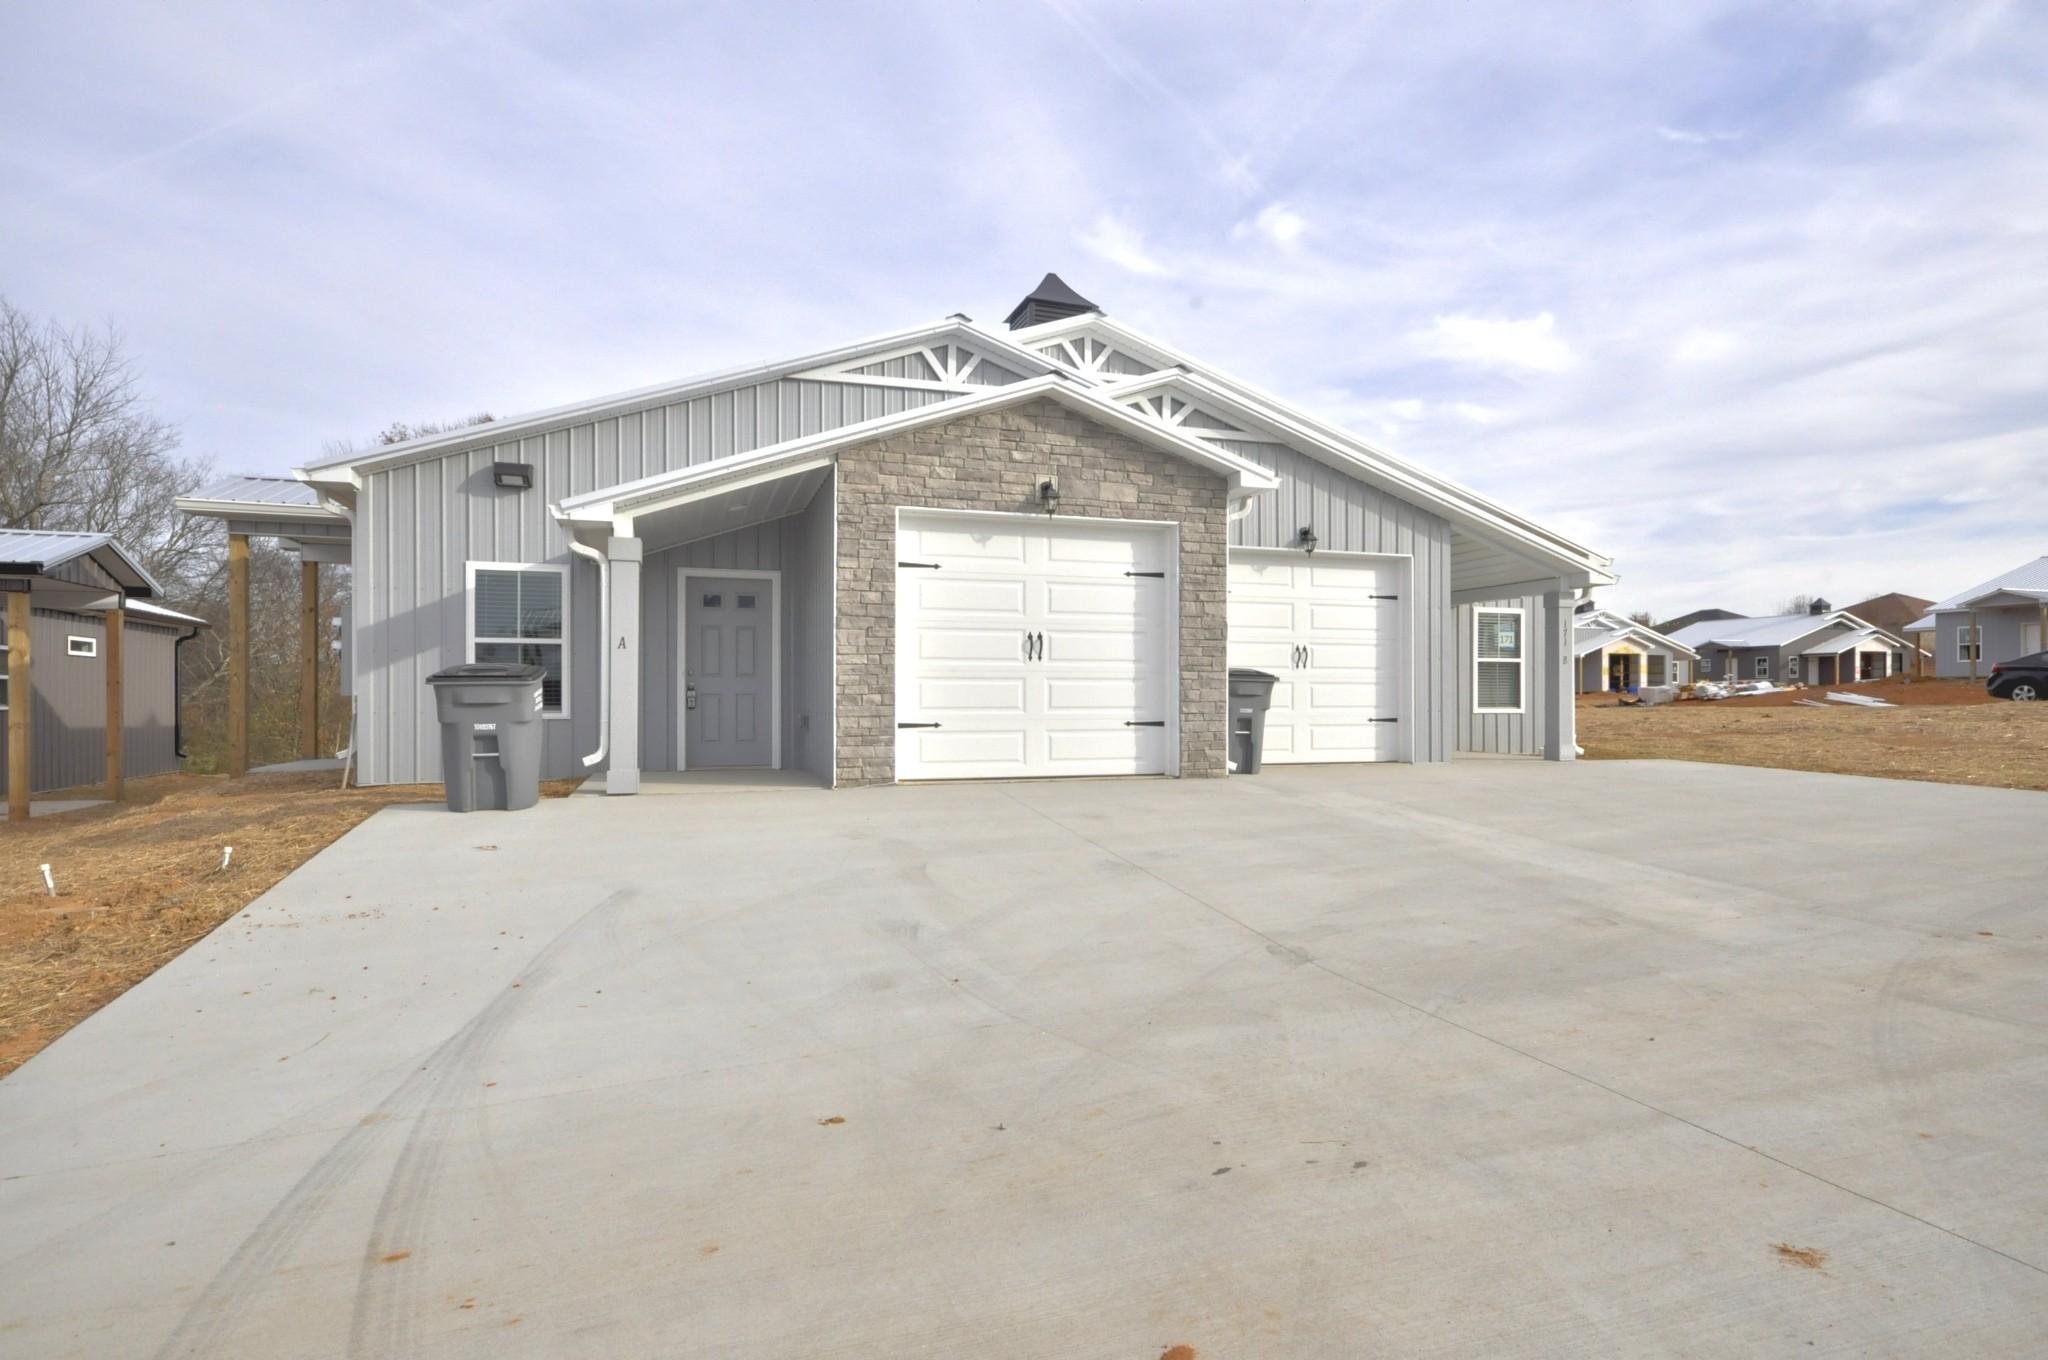 171 BAINBRIDGE DRIVE Unit A #A Property Photo - Clarksville, TN real estate listing